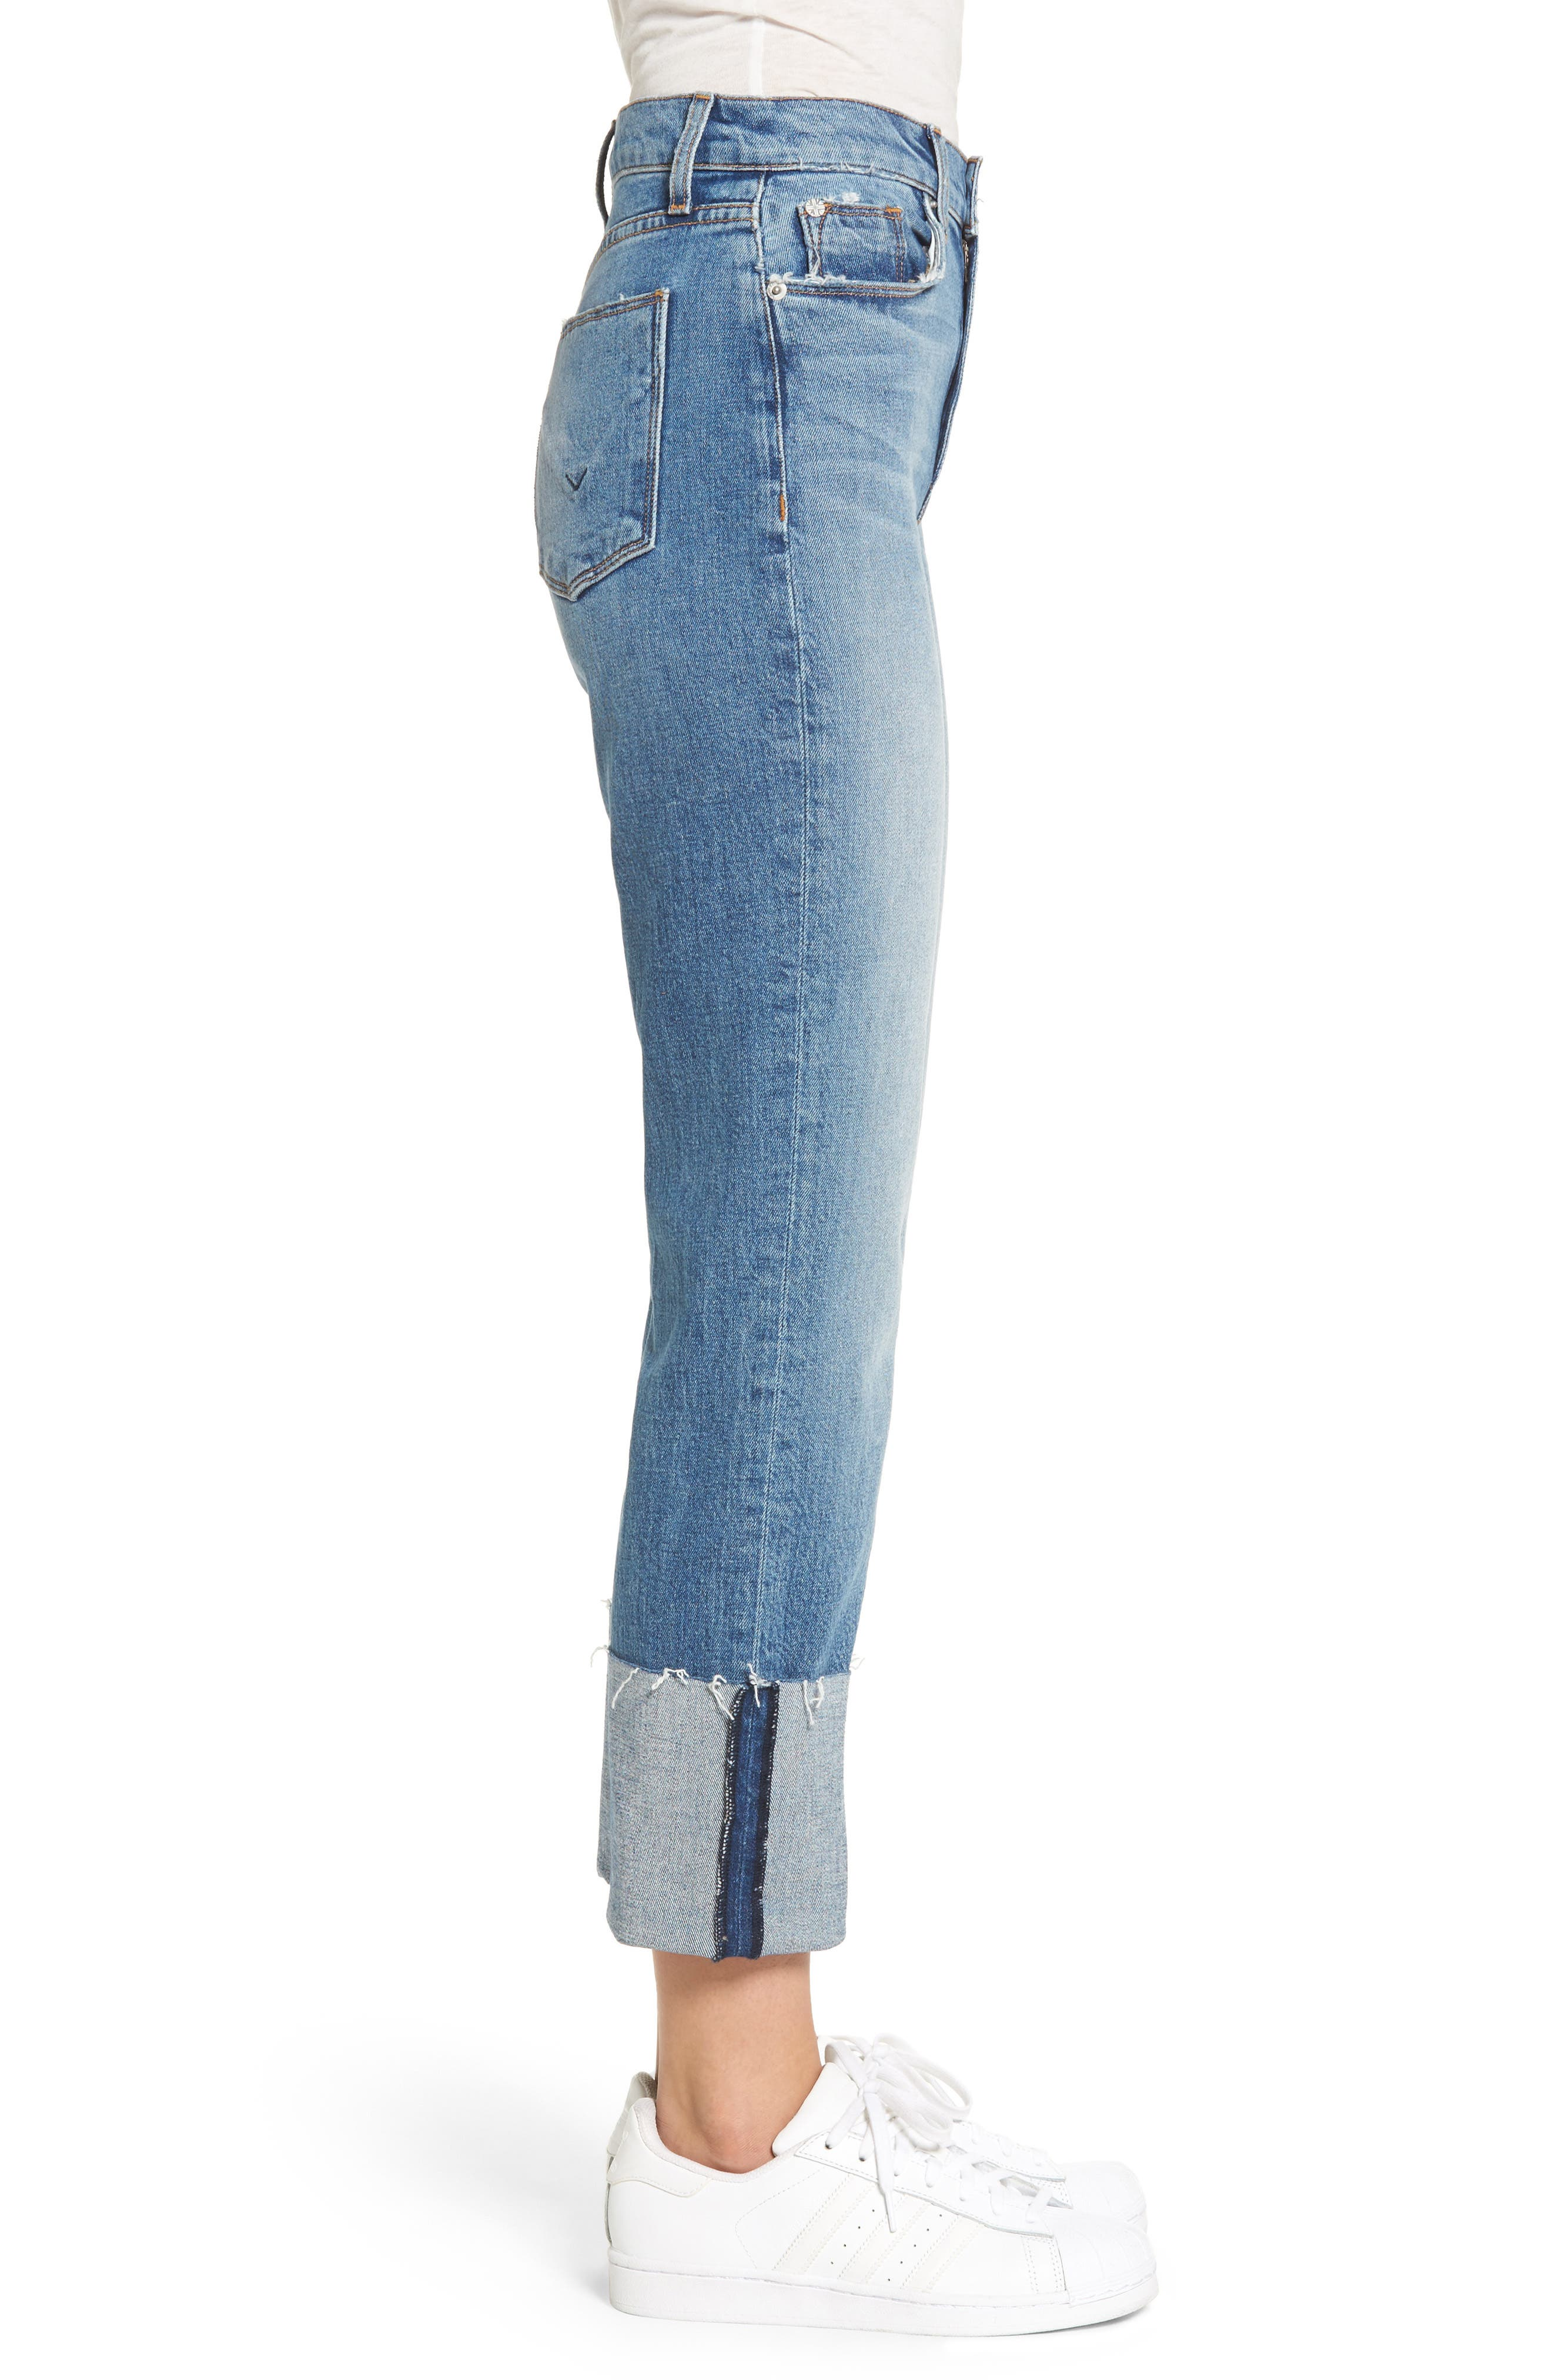 Zoeey High Waist Crop Straight Leg Jeans,                             Alternate thumbnail 10, color,